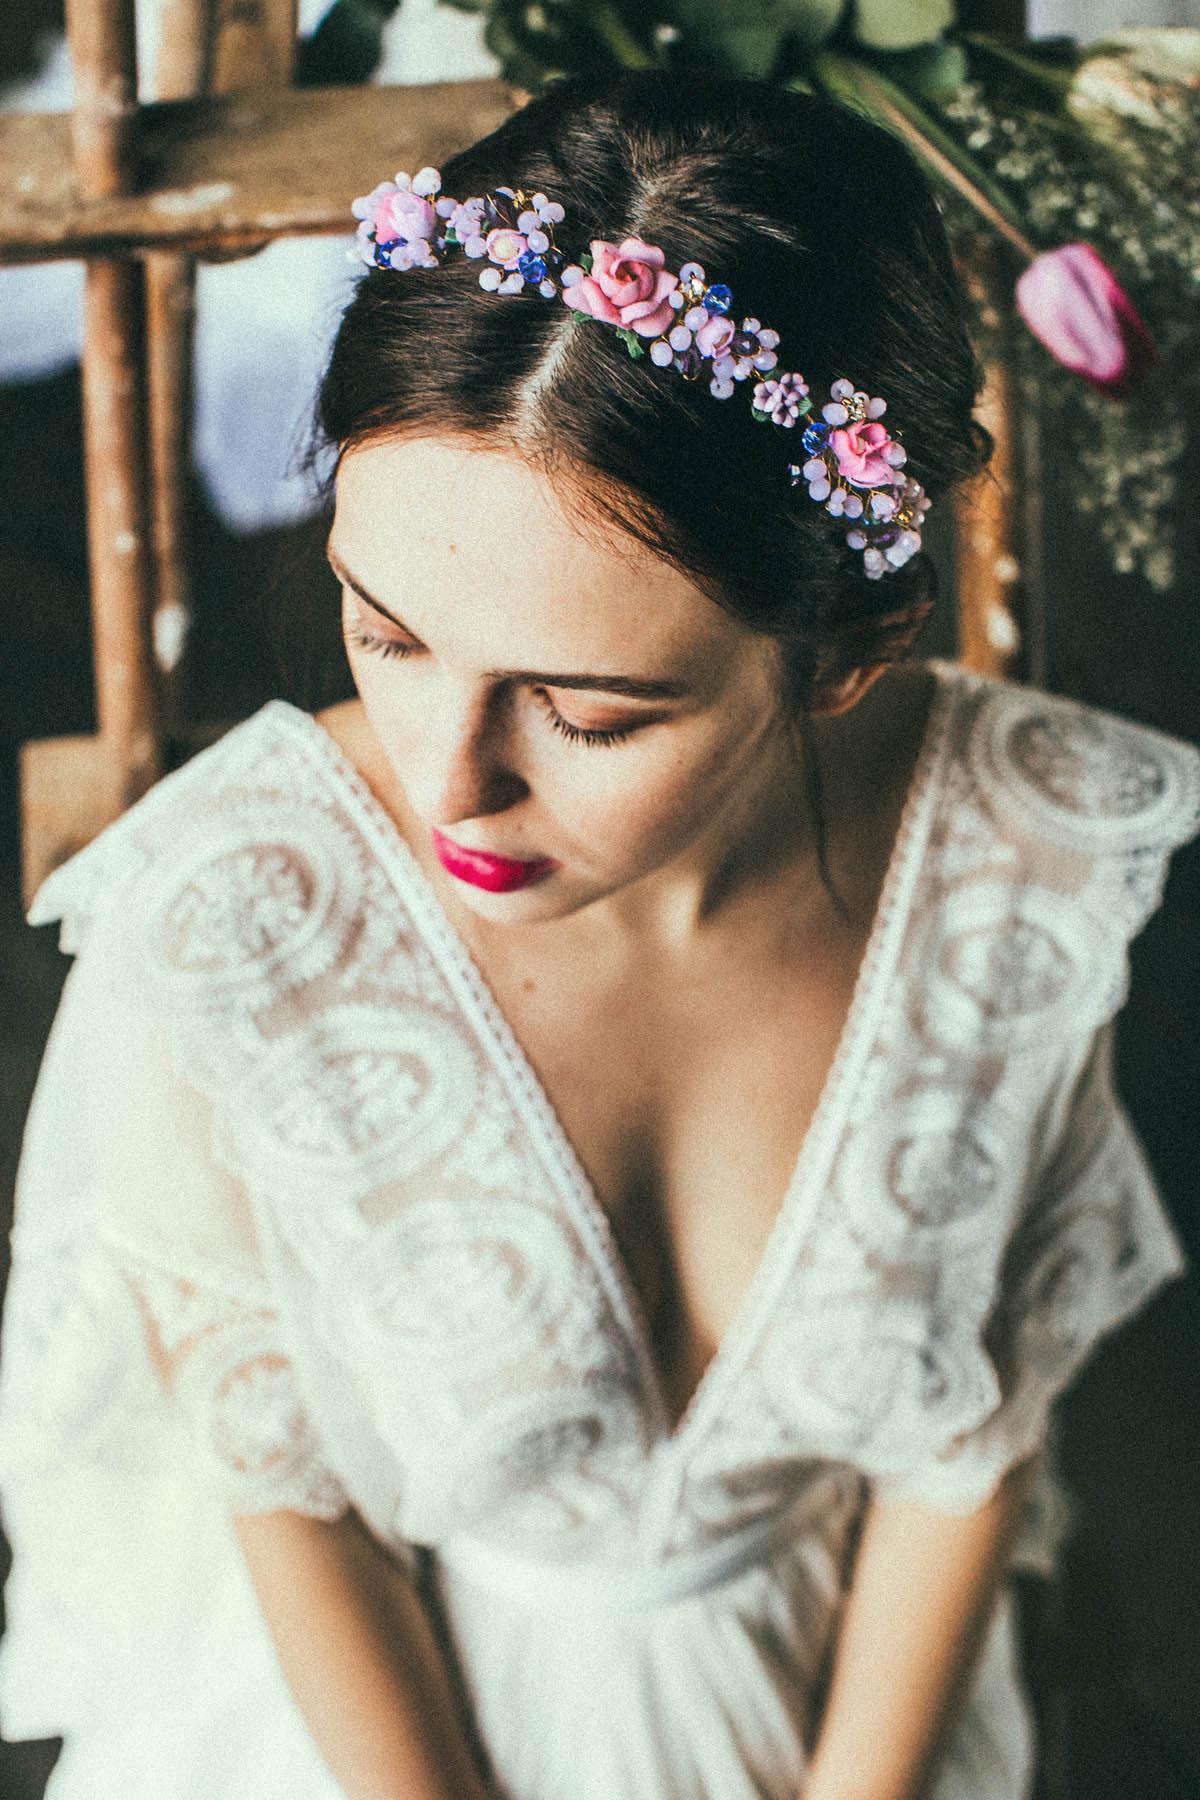 We-Are-Flowergirls_Lookbook_Flowercrown_Blumenkranz_SS17.1_c_Lupi-Spuma_Web_19.jpg